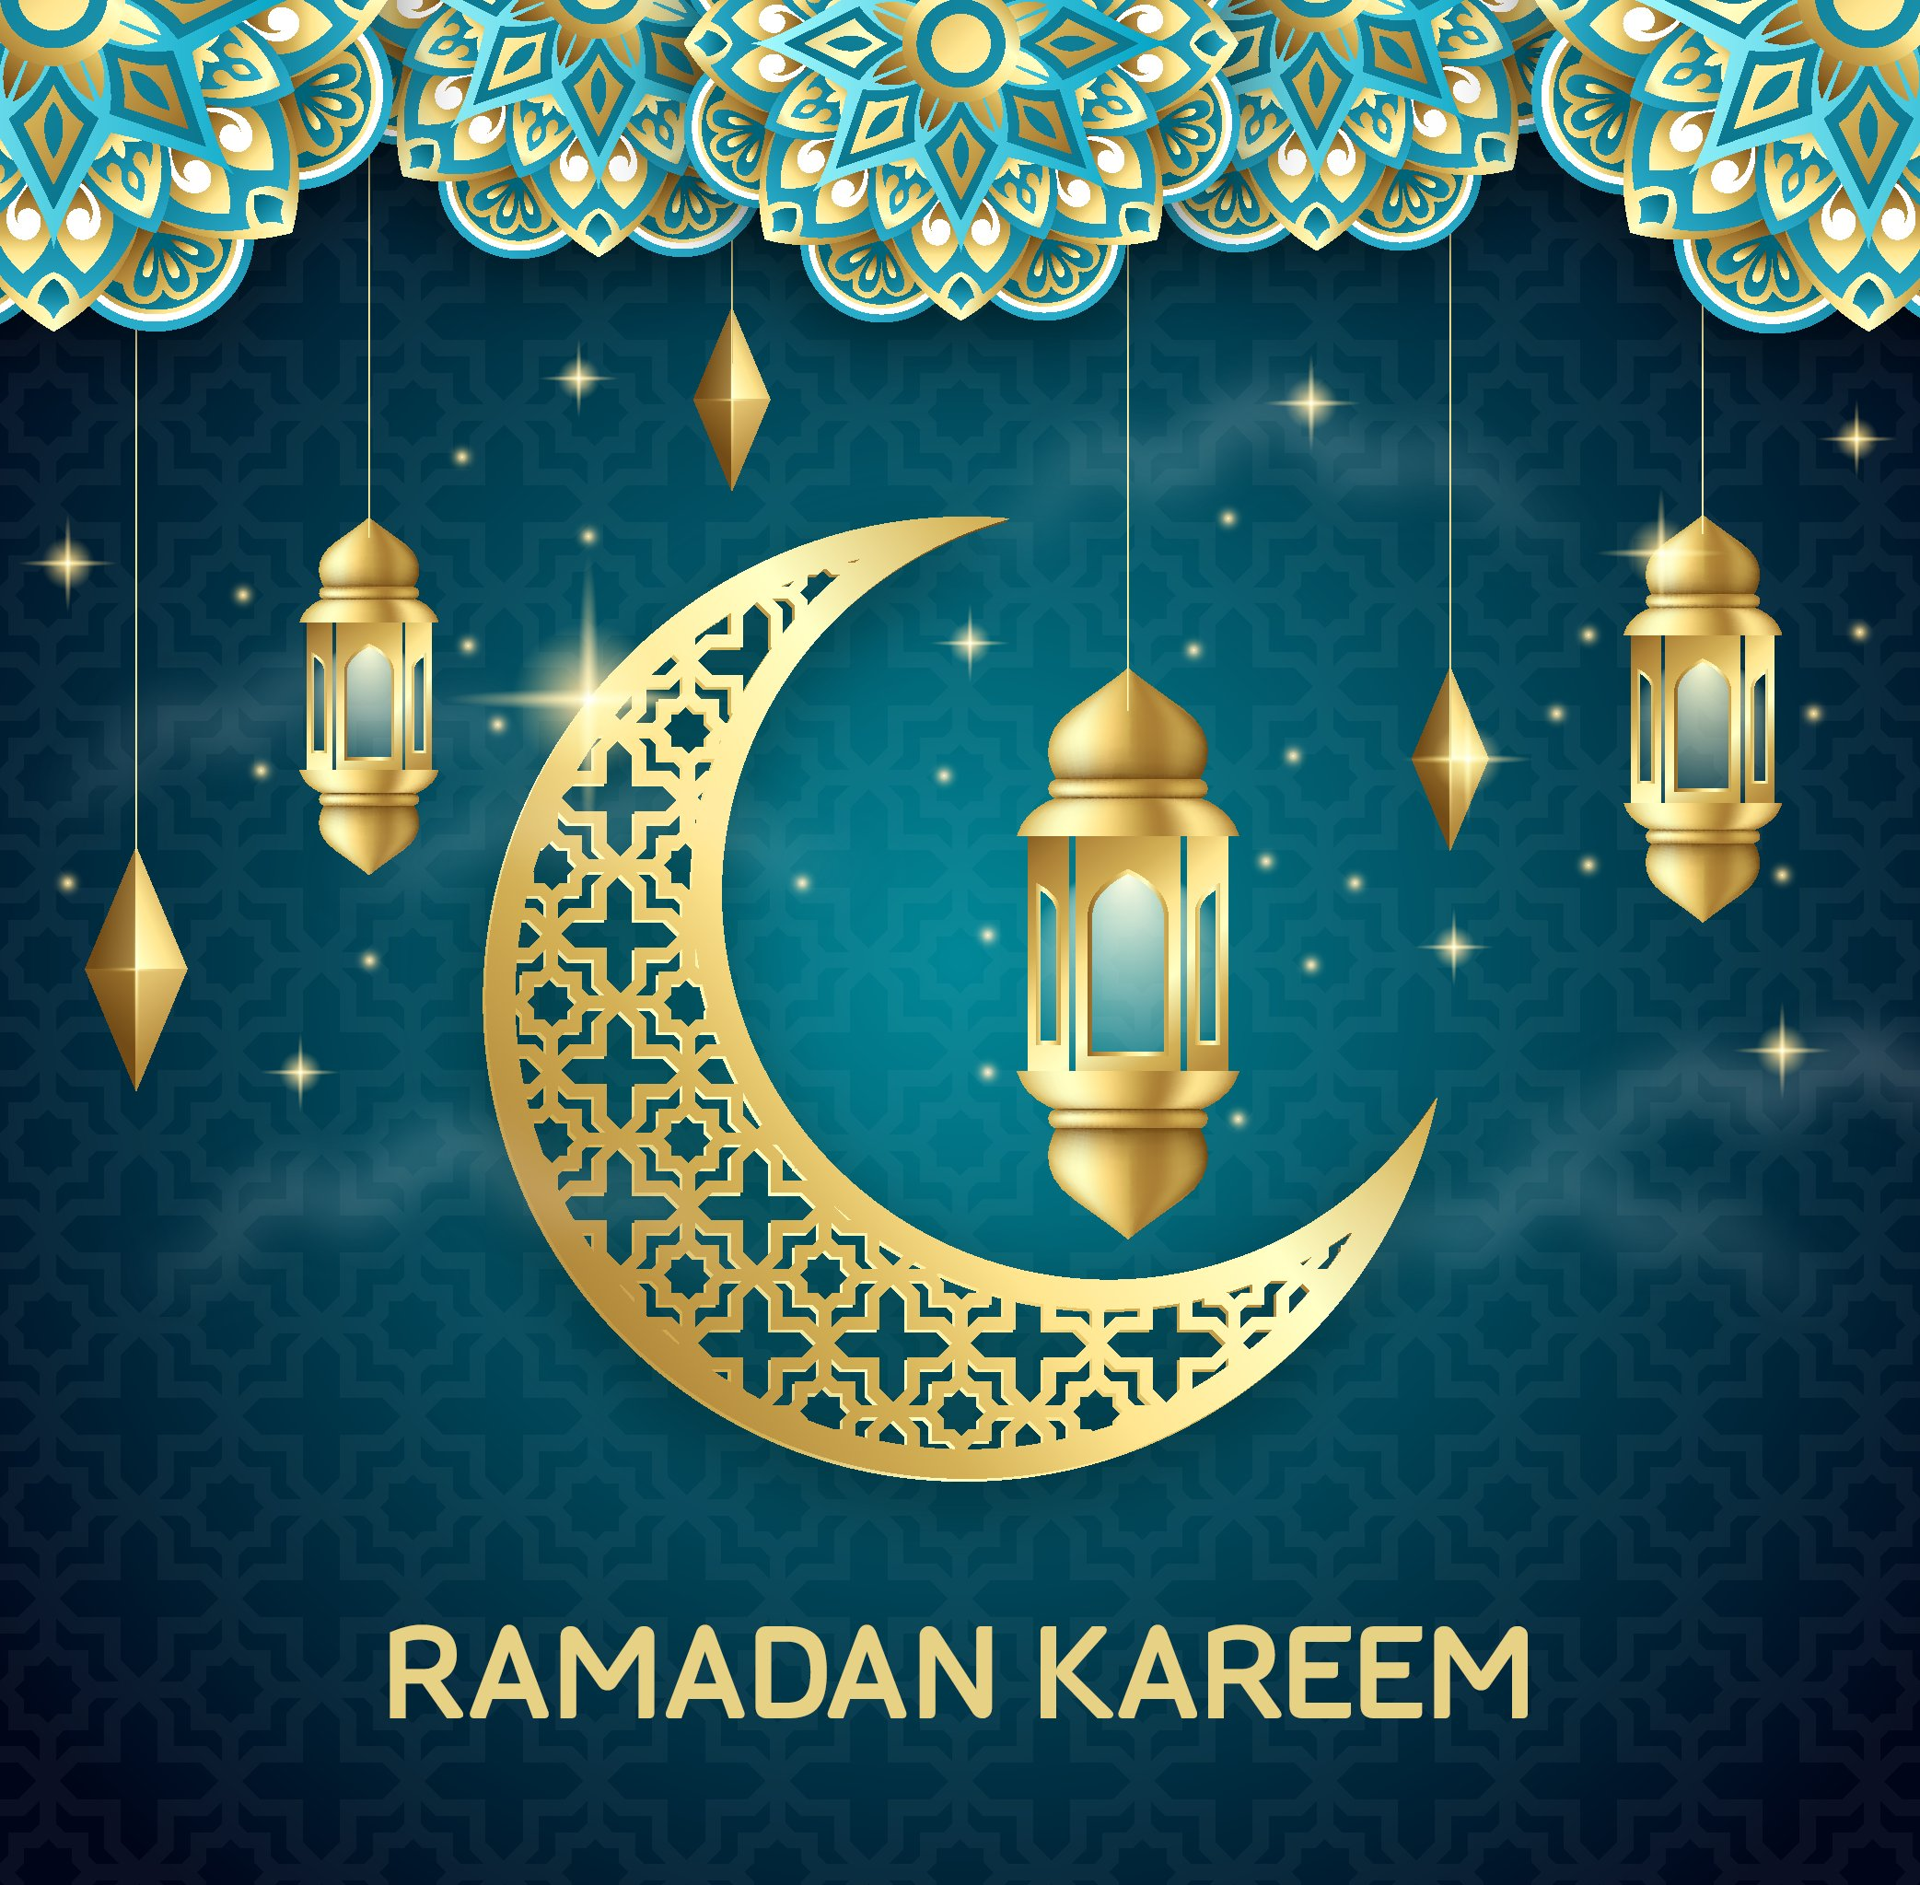 #RamadanKareem: Chief Kadhi's advice as the Muslims Holy Month Begin